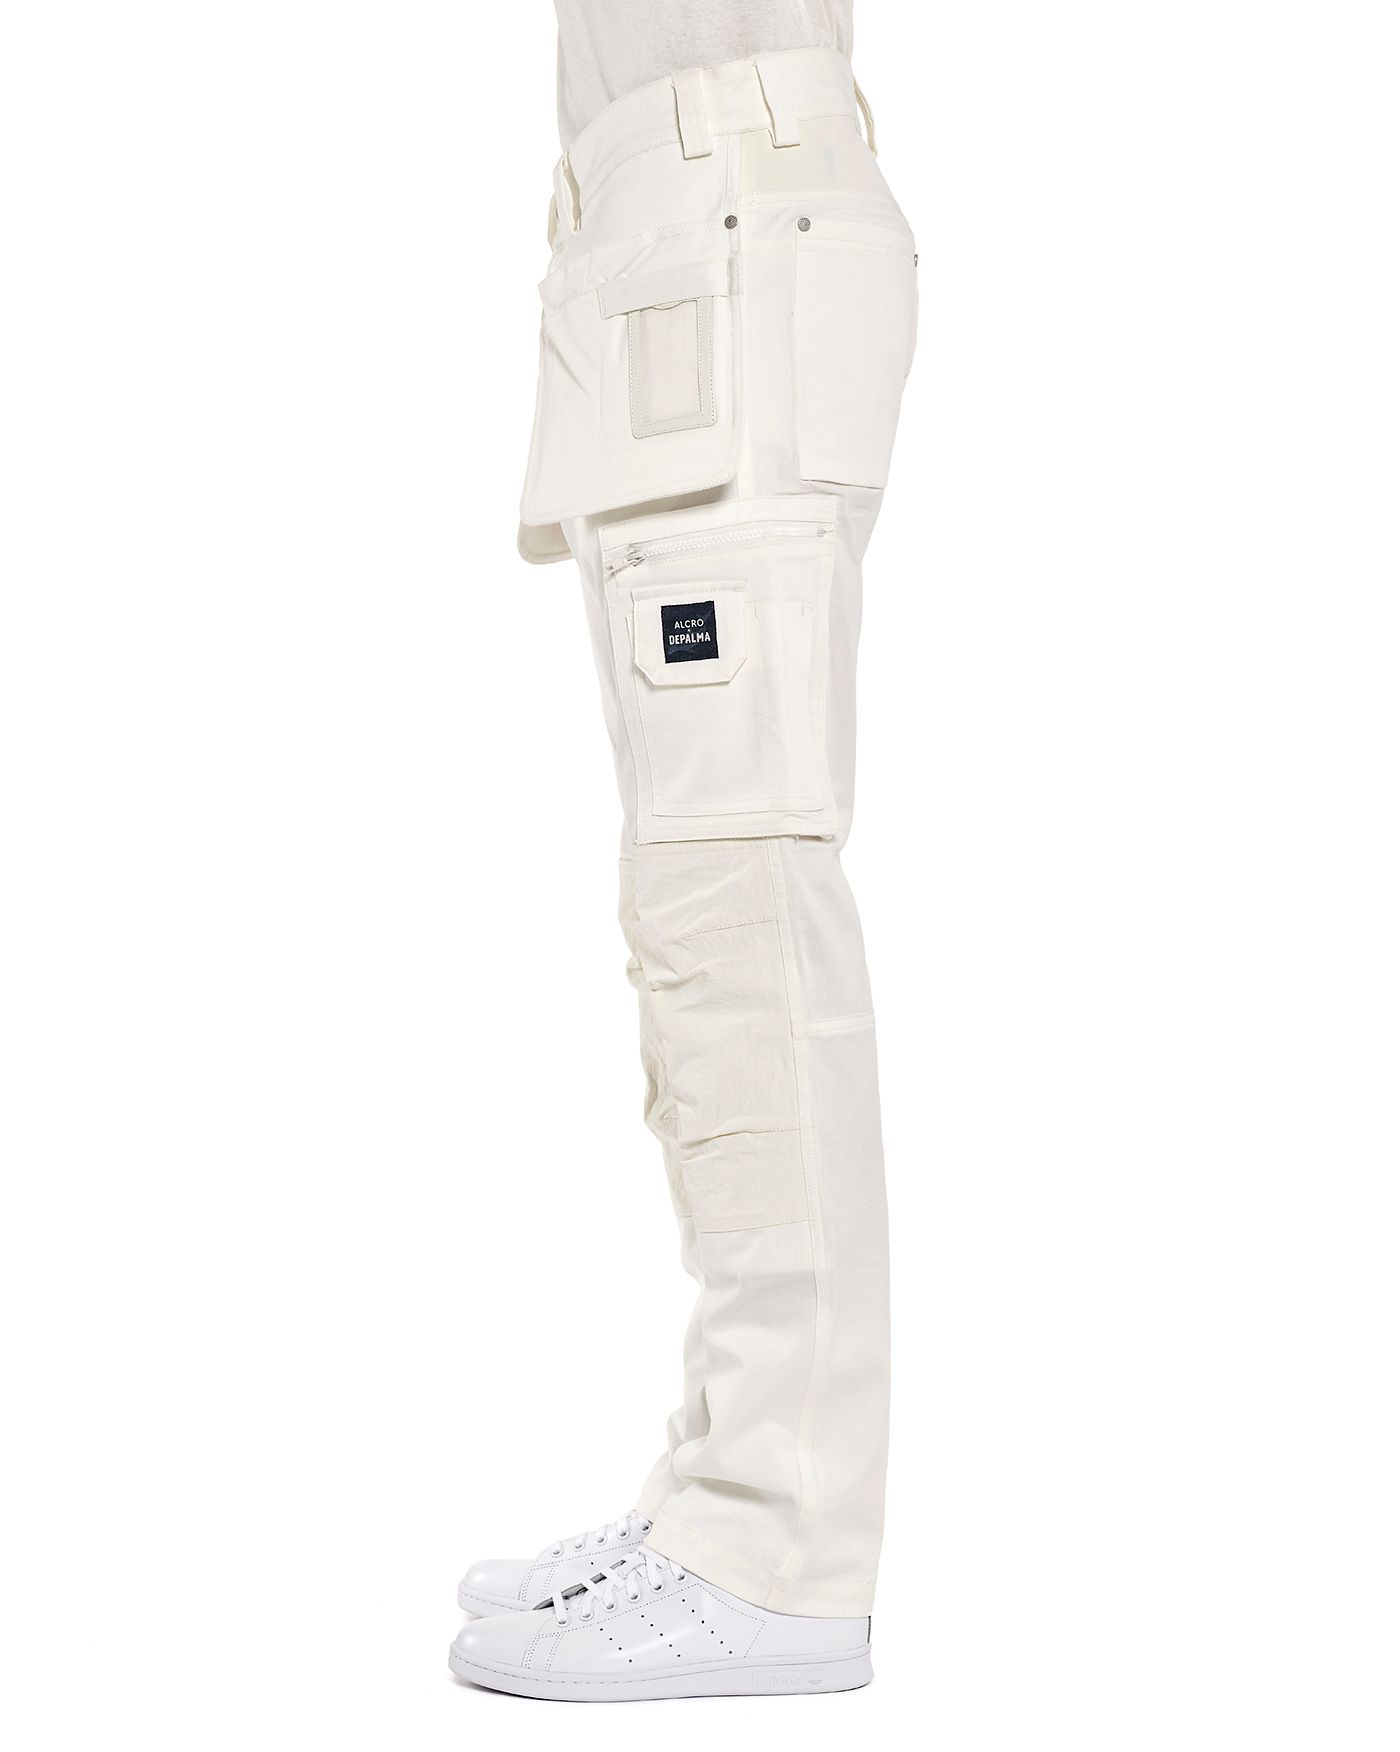 Photo of Alcro Painter Pants Painter Pants, White